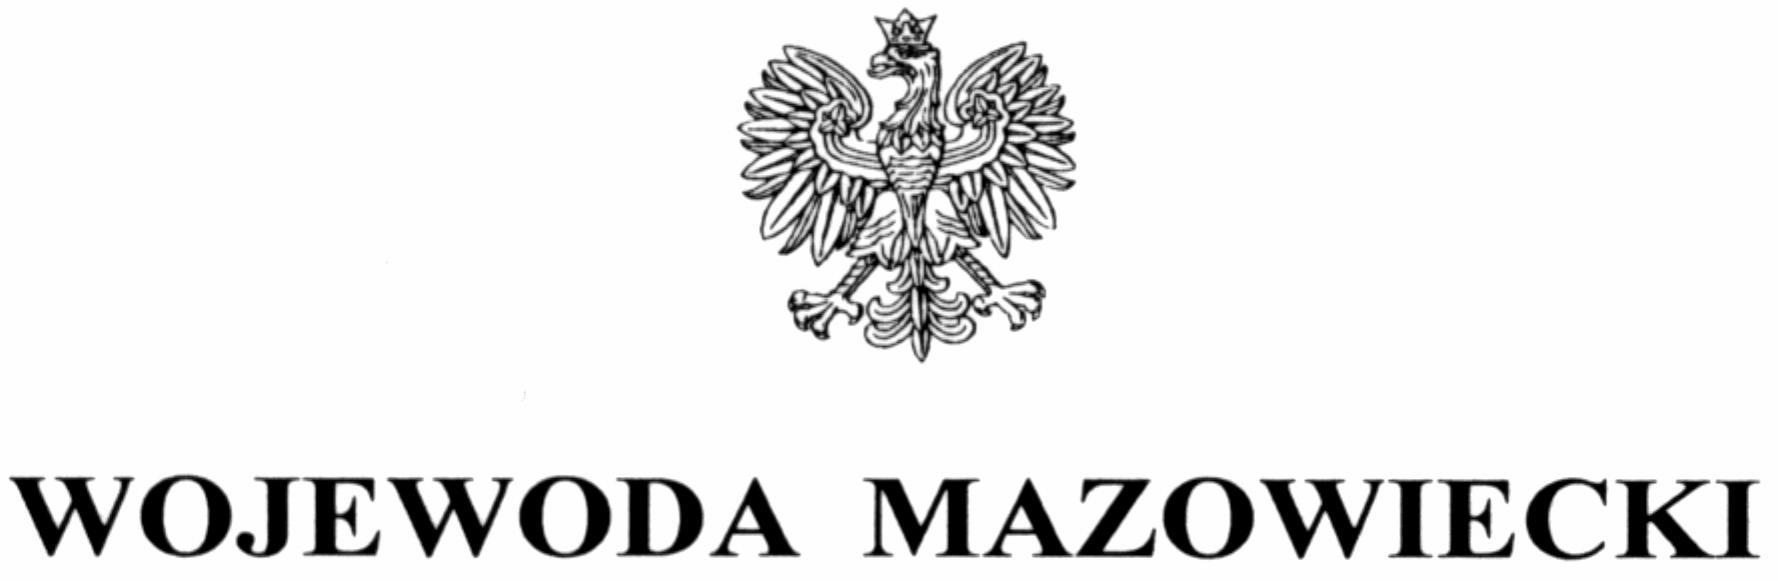 https://www.mazowieckie.pl/